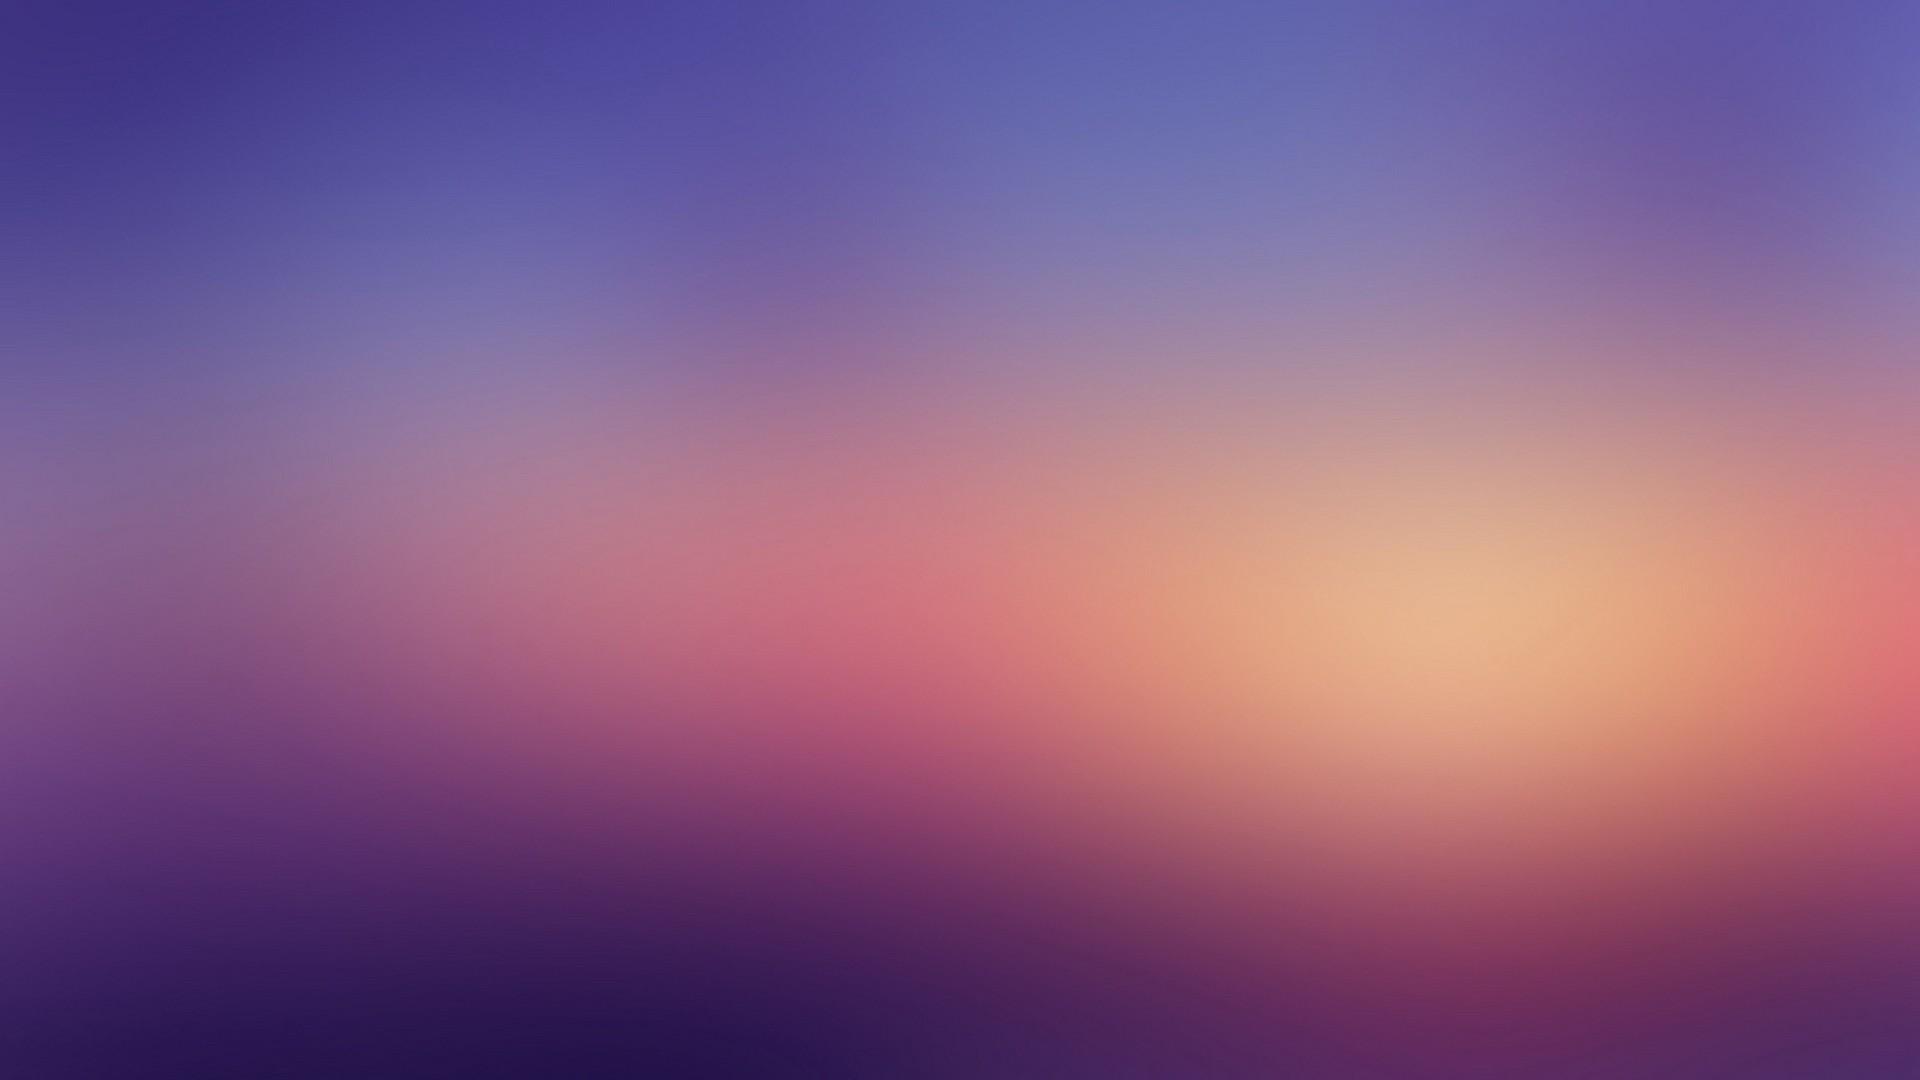 Gradient Background Wallpaper